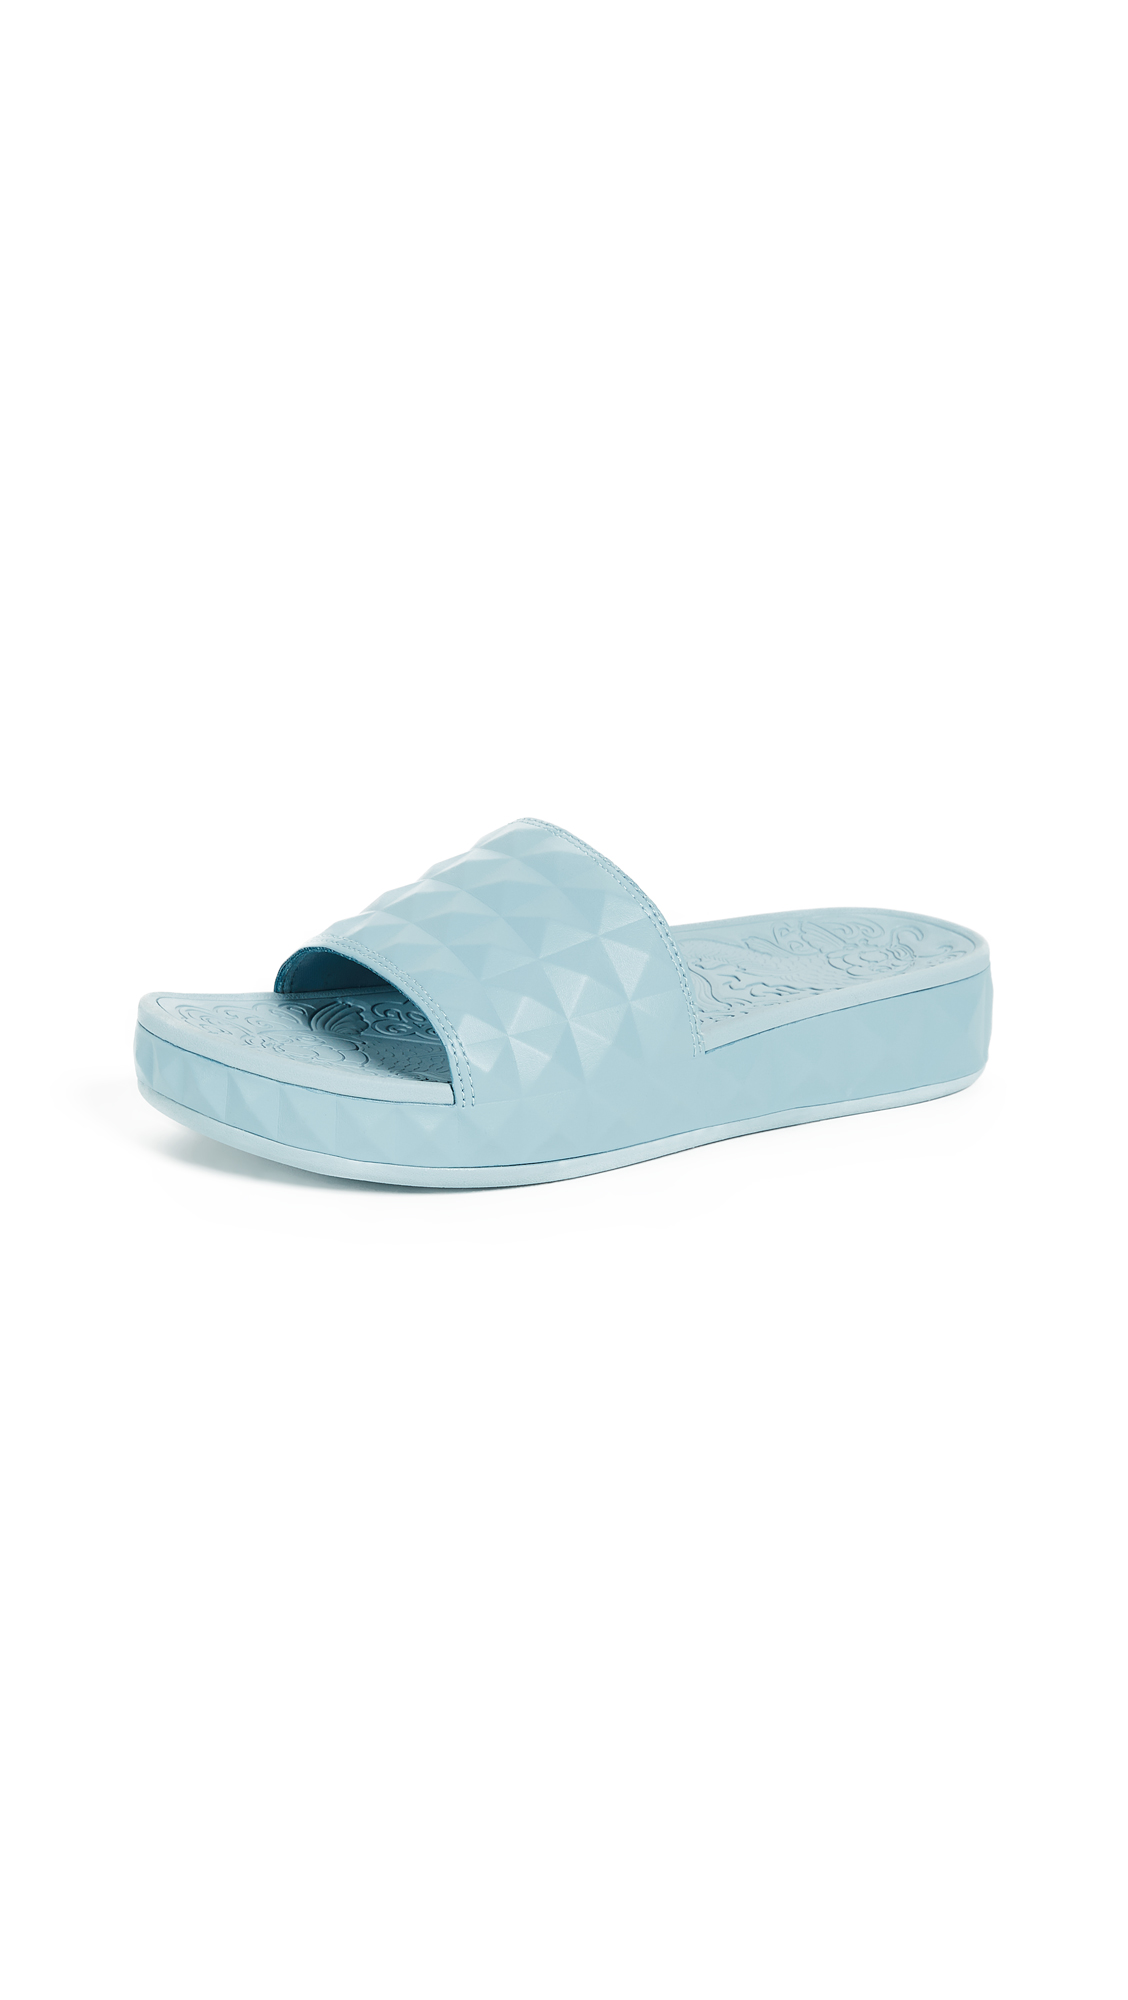 Ash Splash Slides - Ice Blue